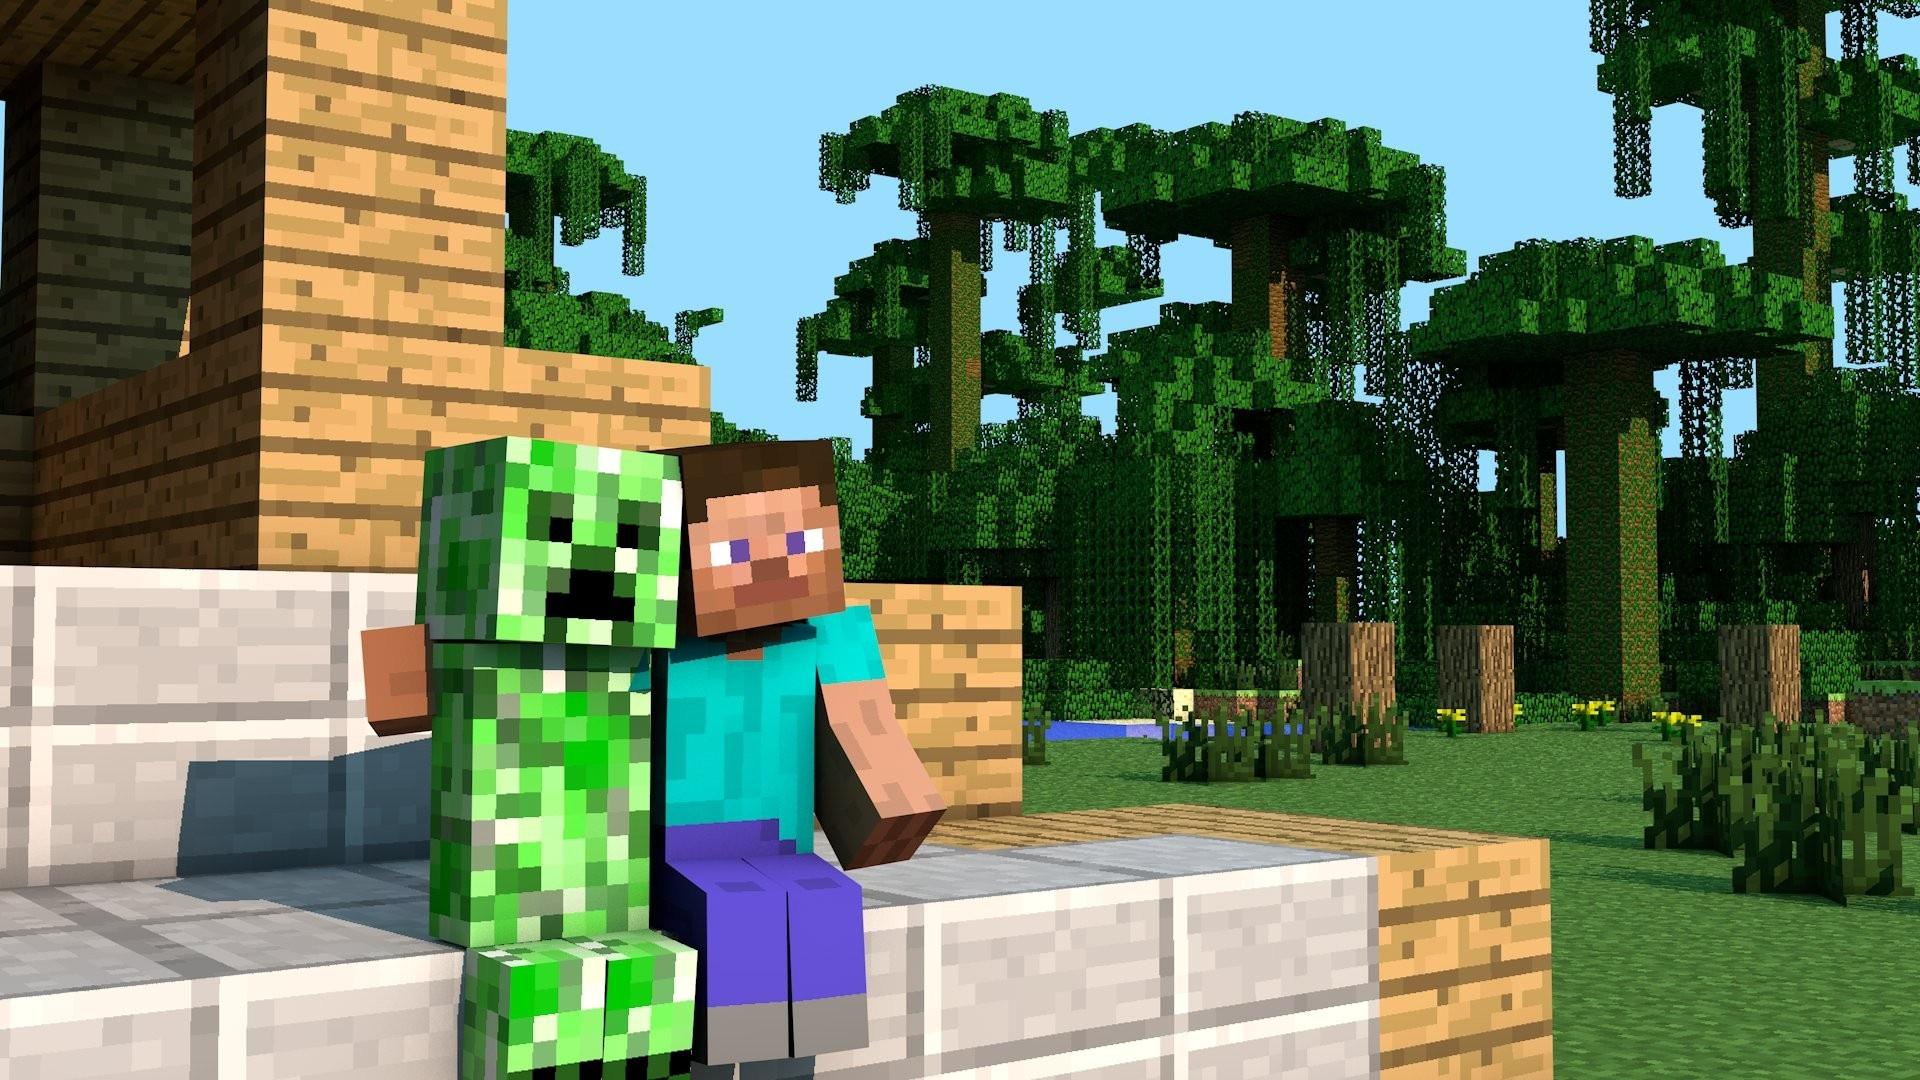 Minecraft!